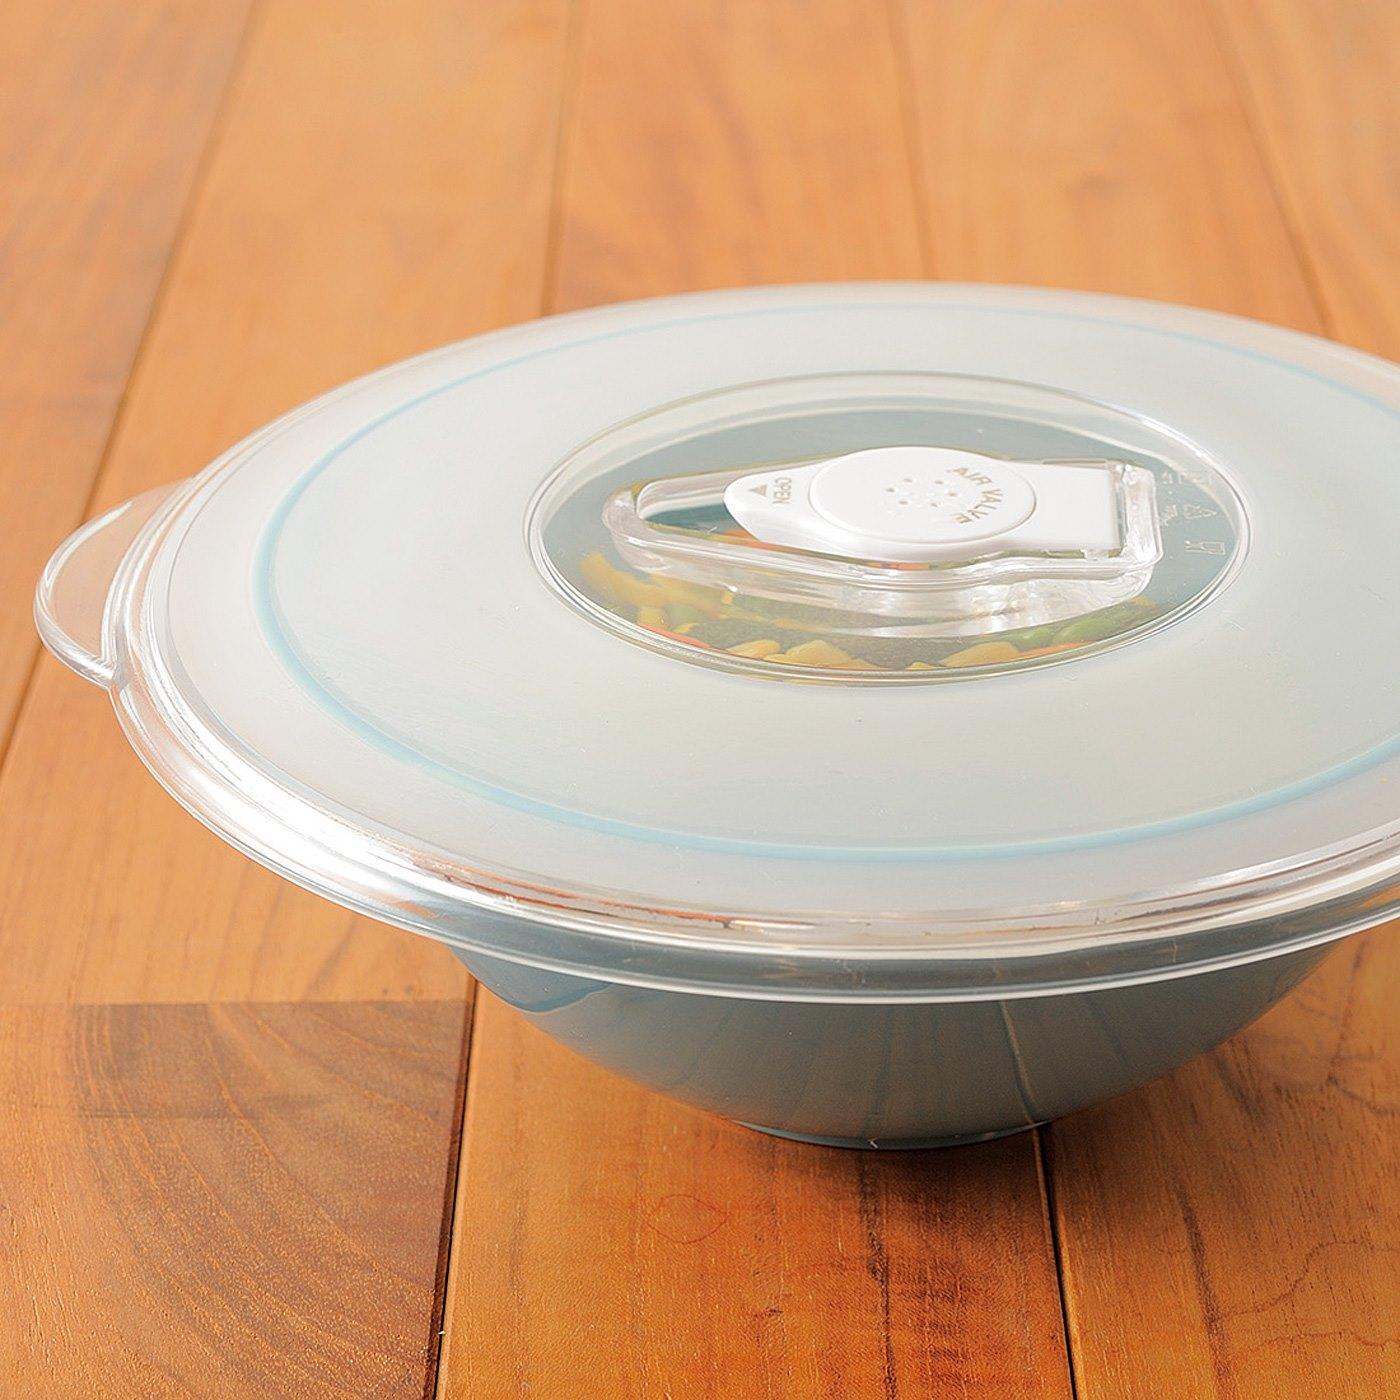 HOW TO COOK (3)汁気の多い料理や、残りものもお皿のまま保存できます。